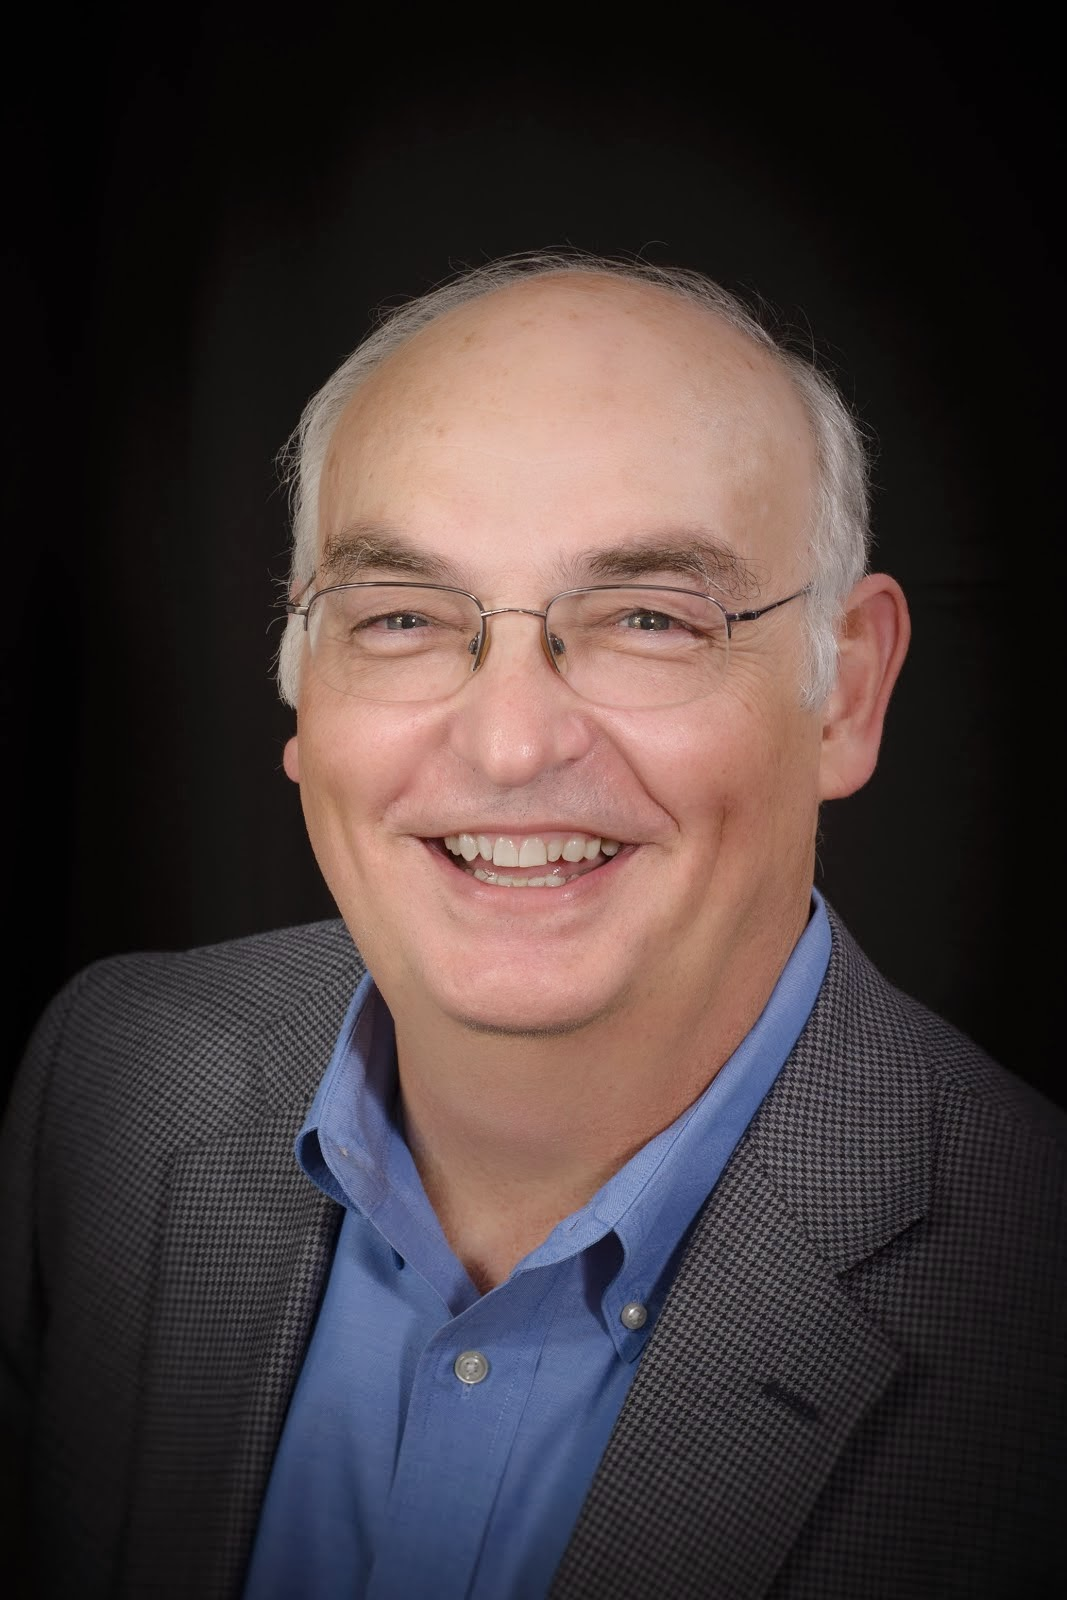 Dr. Ed Steele